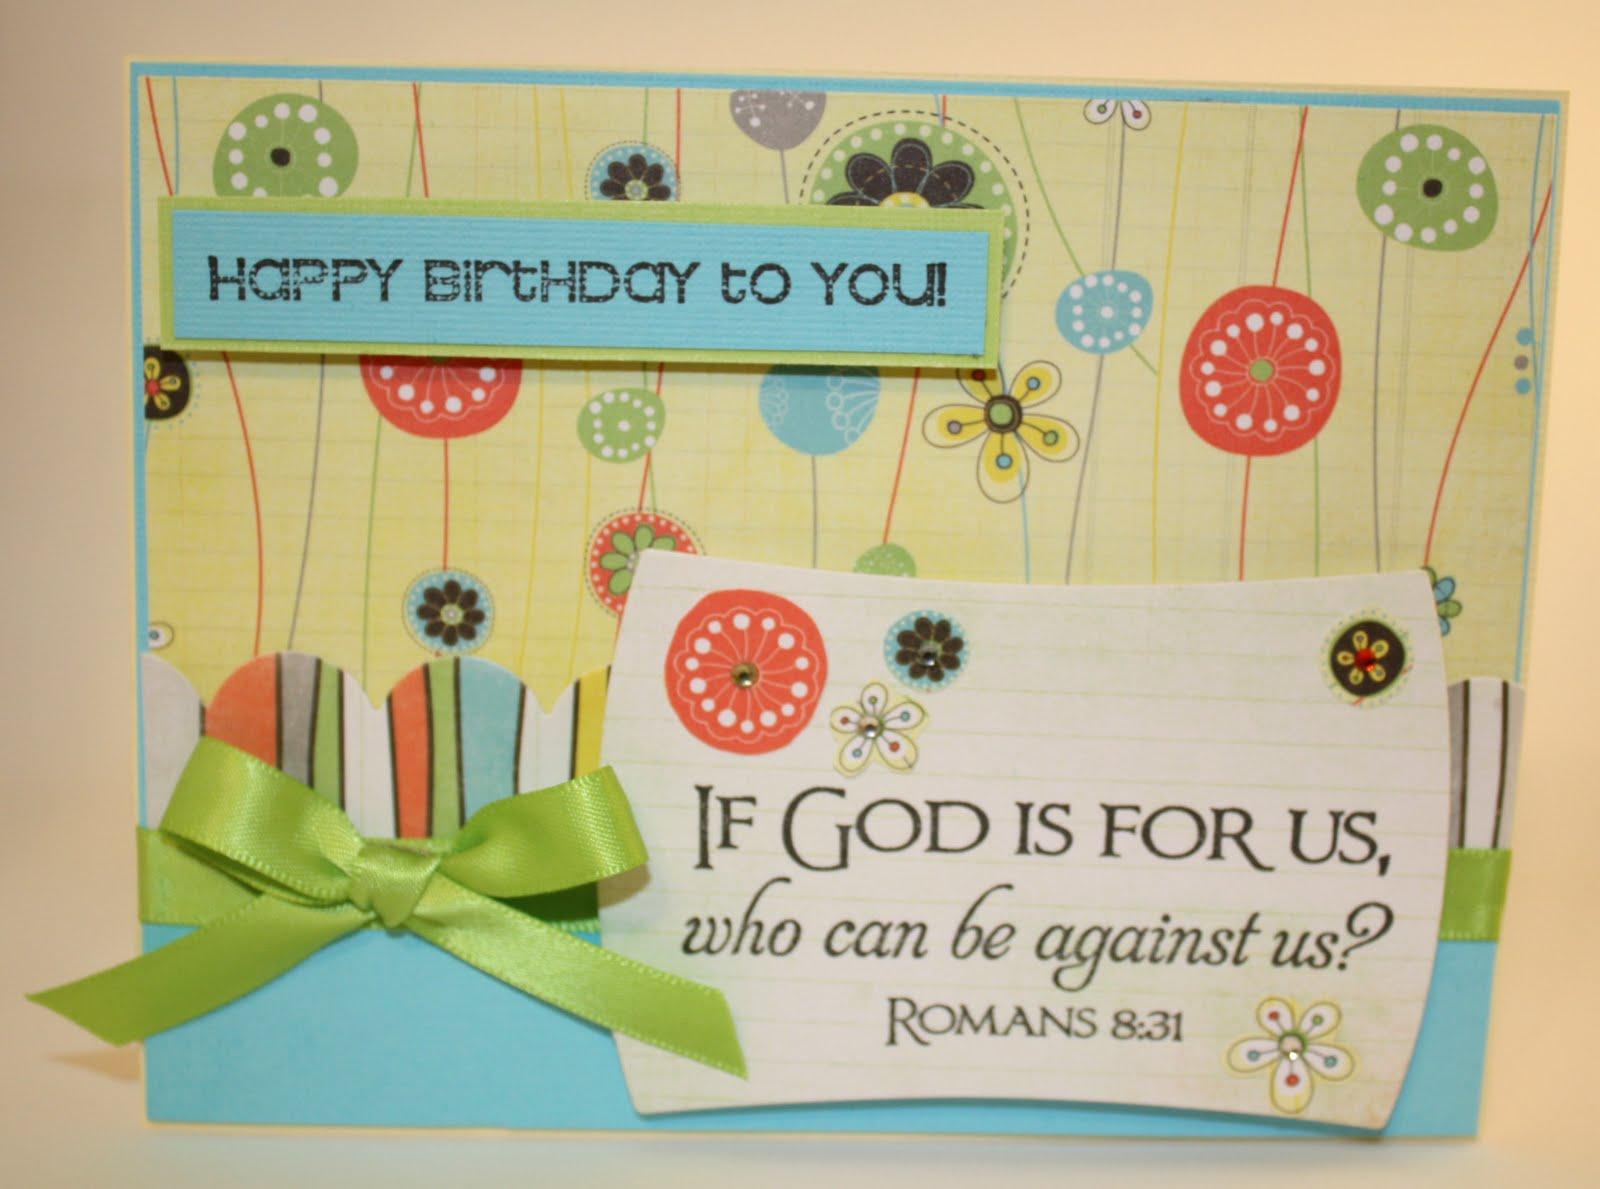 Delightful Details Christian Paper Crafts Birthday Blog Hop!!